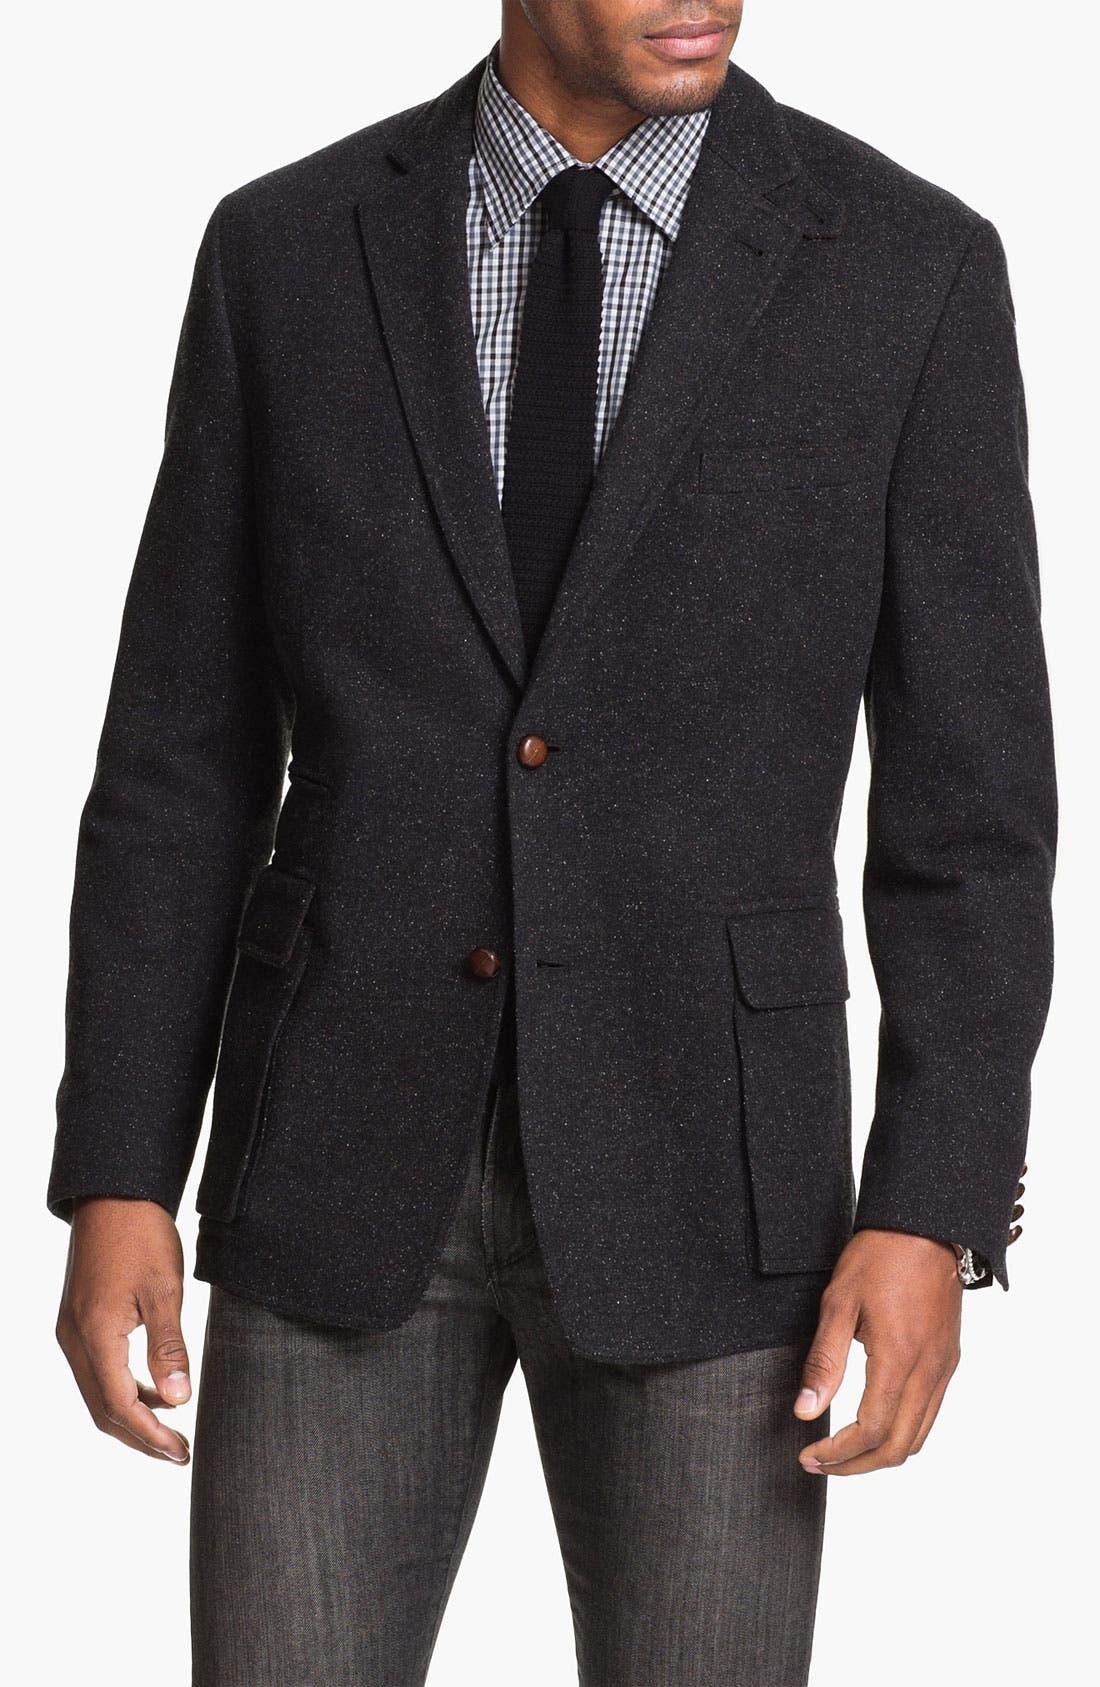 Main Image - Kroon 'Waits' Tweed Sportcoat